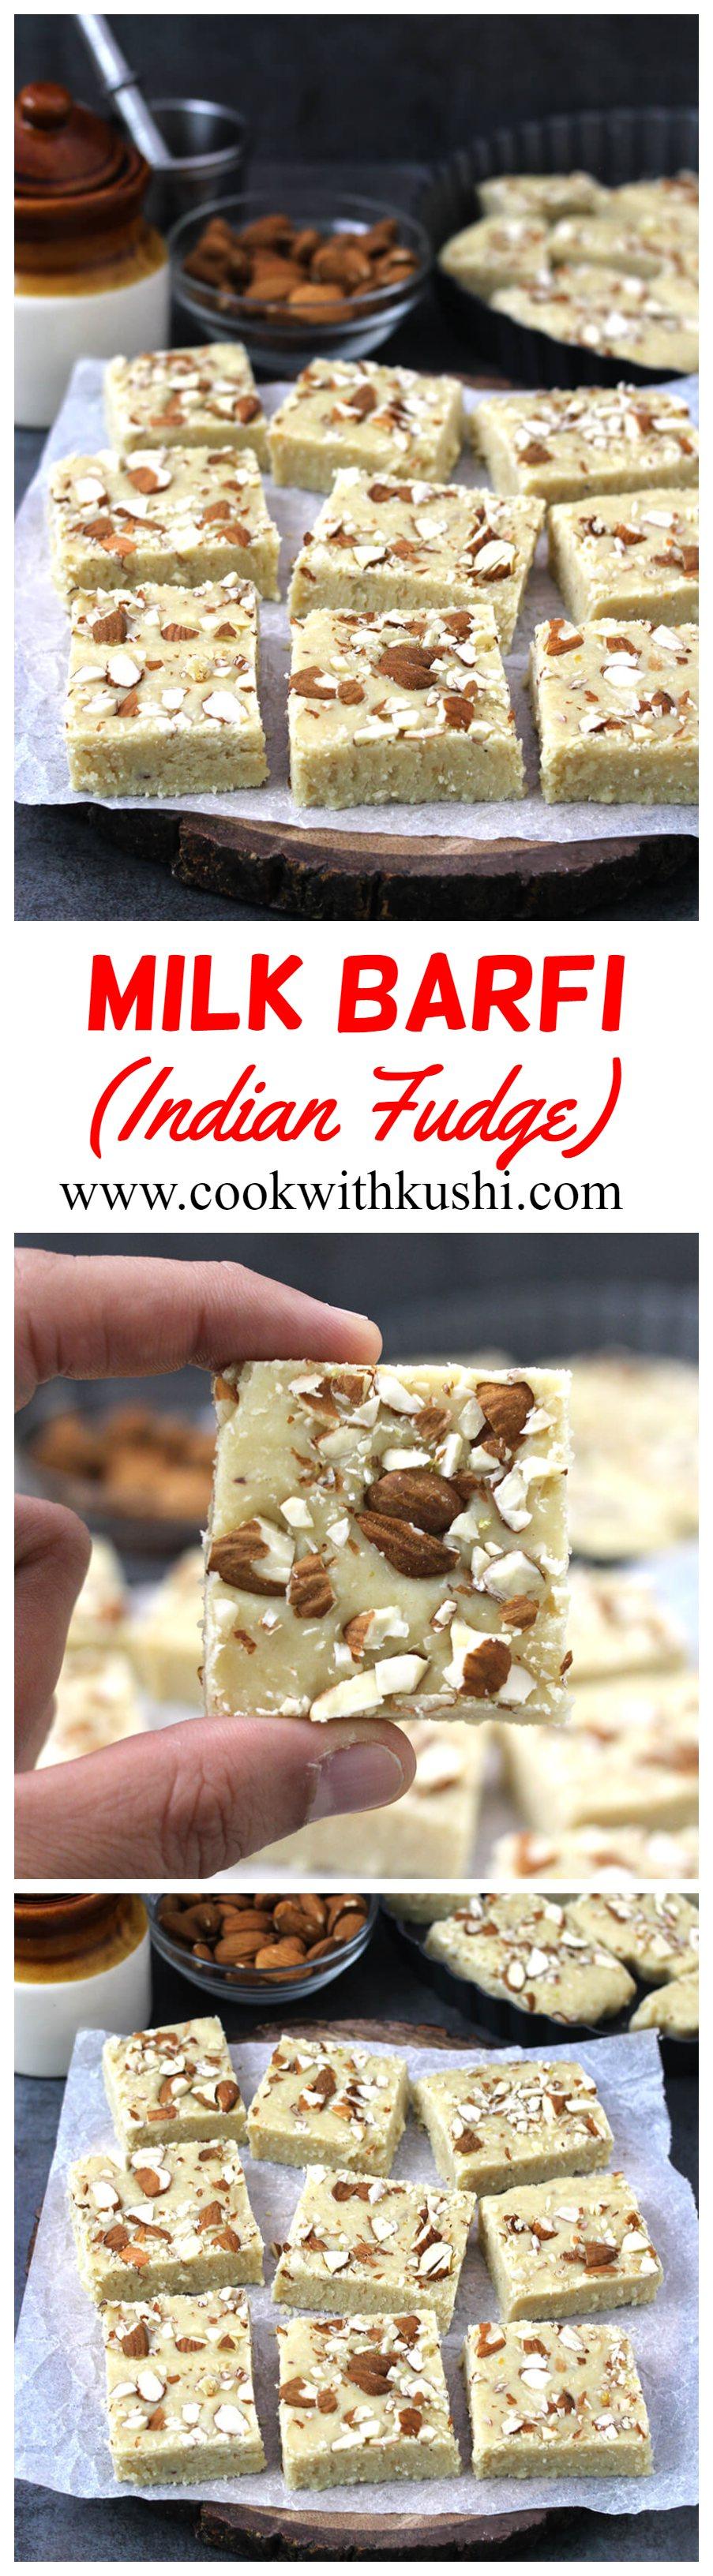 #milkbarfi #milkburfi #milkpowderburfi #indianfude #milkpowderrecipes #indiansweets #indiandesserts #diwalisweets #diwalirecipes #indianfestival #milksweets #instantsweets